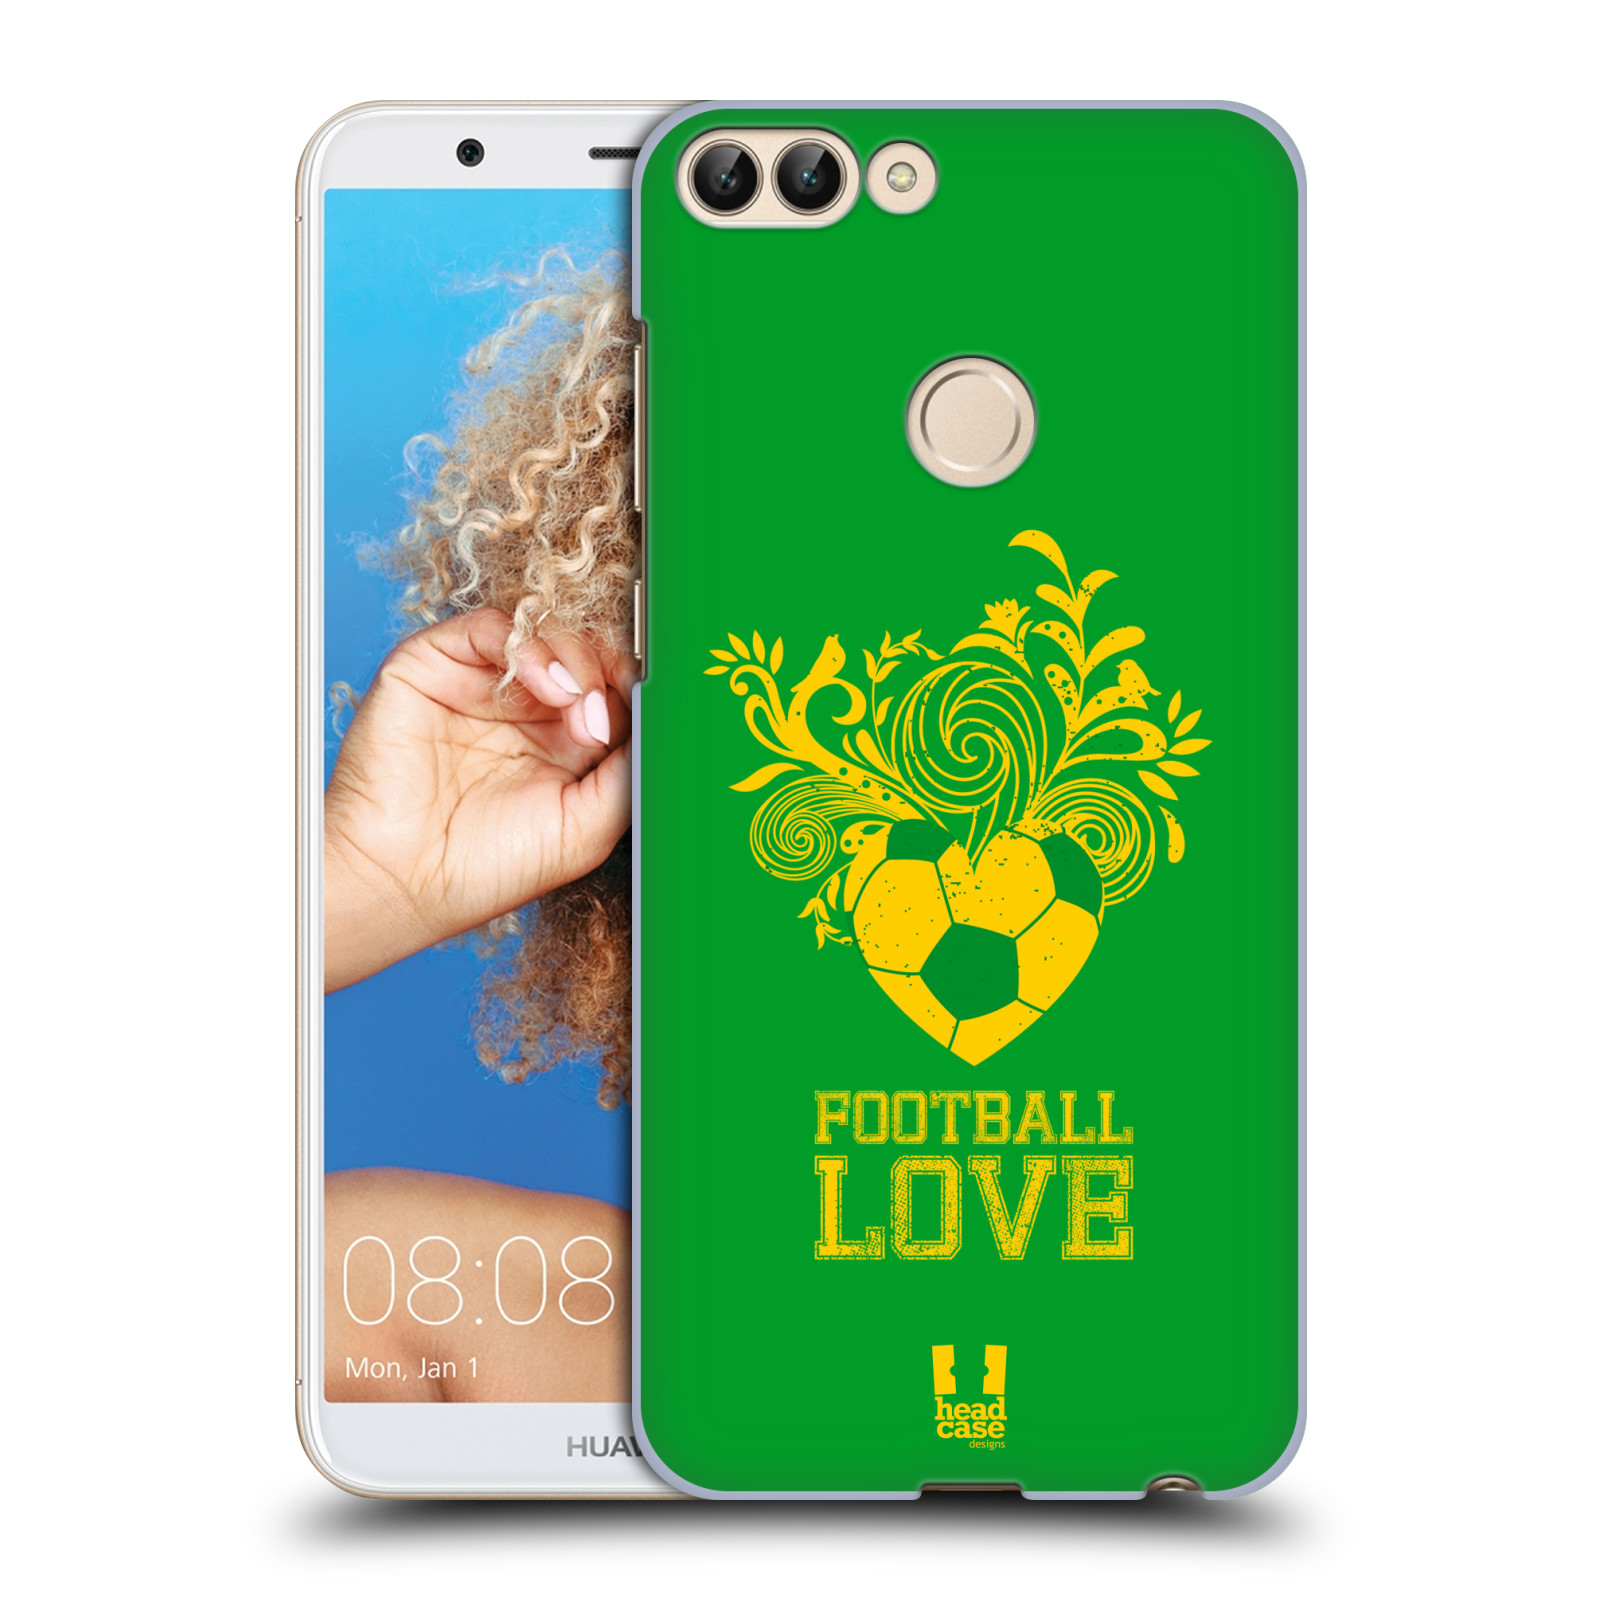 HEAD CASE plastový obal na mobil Huawei P Smart Sport fotbalová láska zelená barva